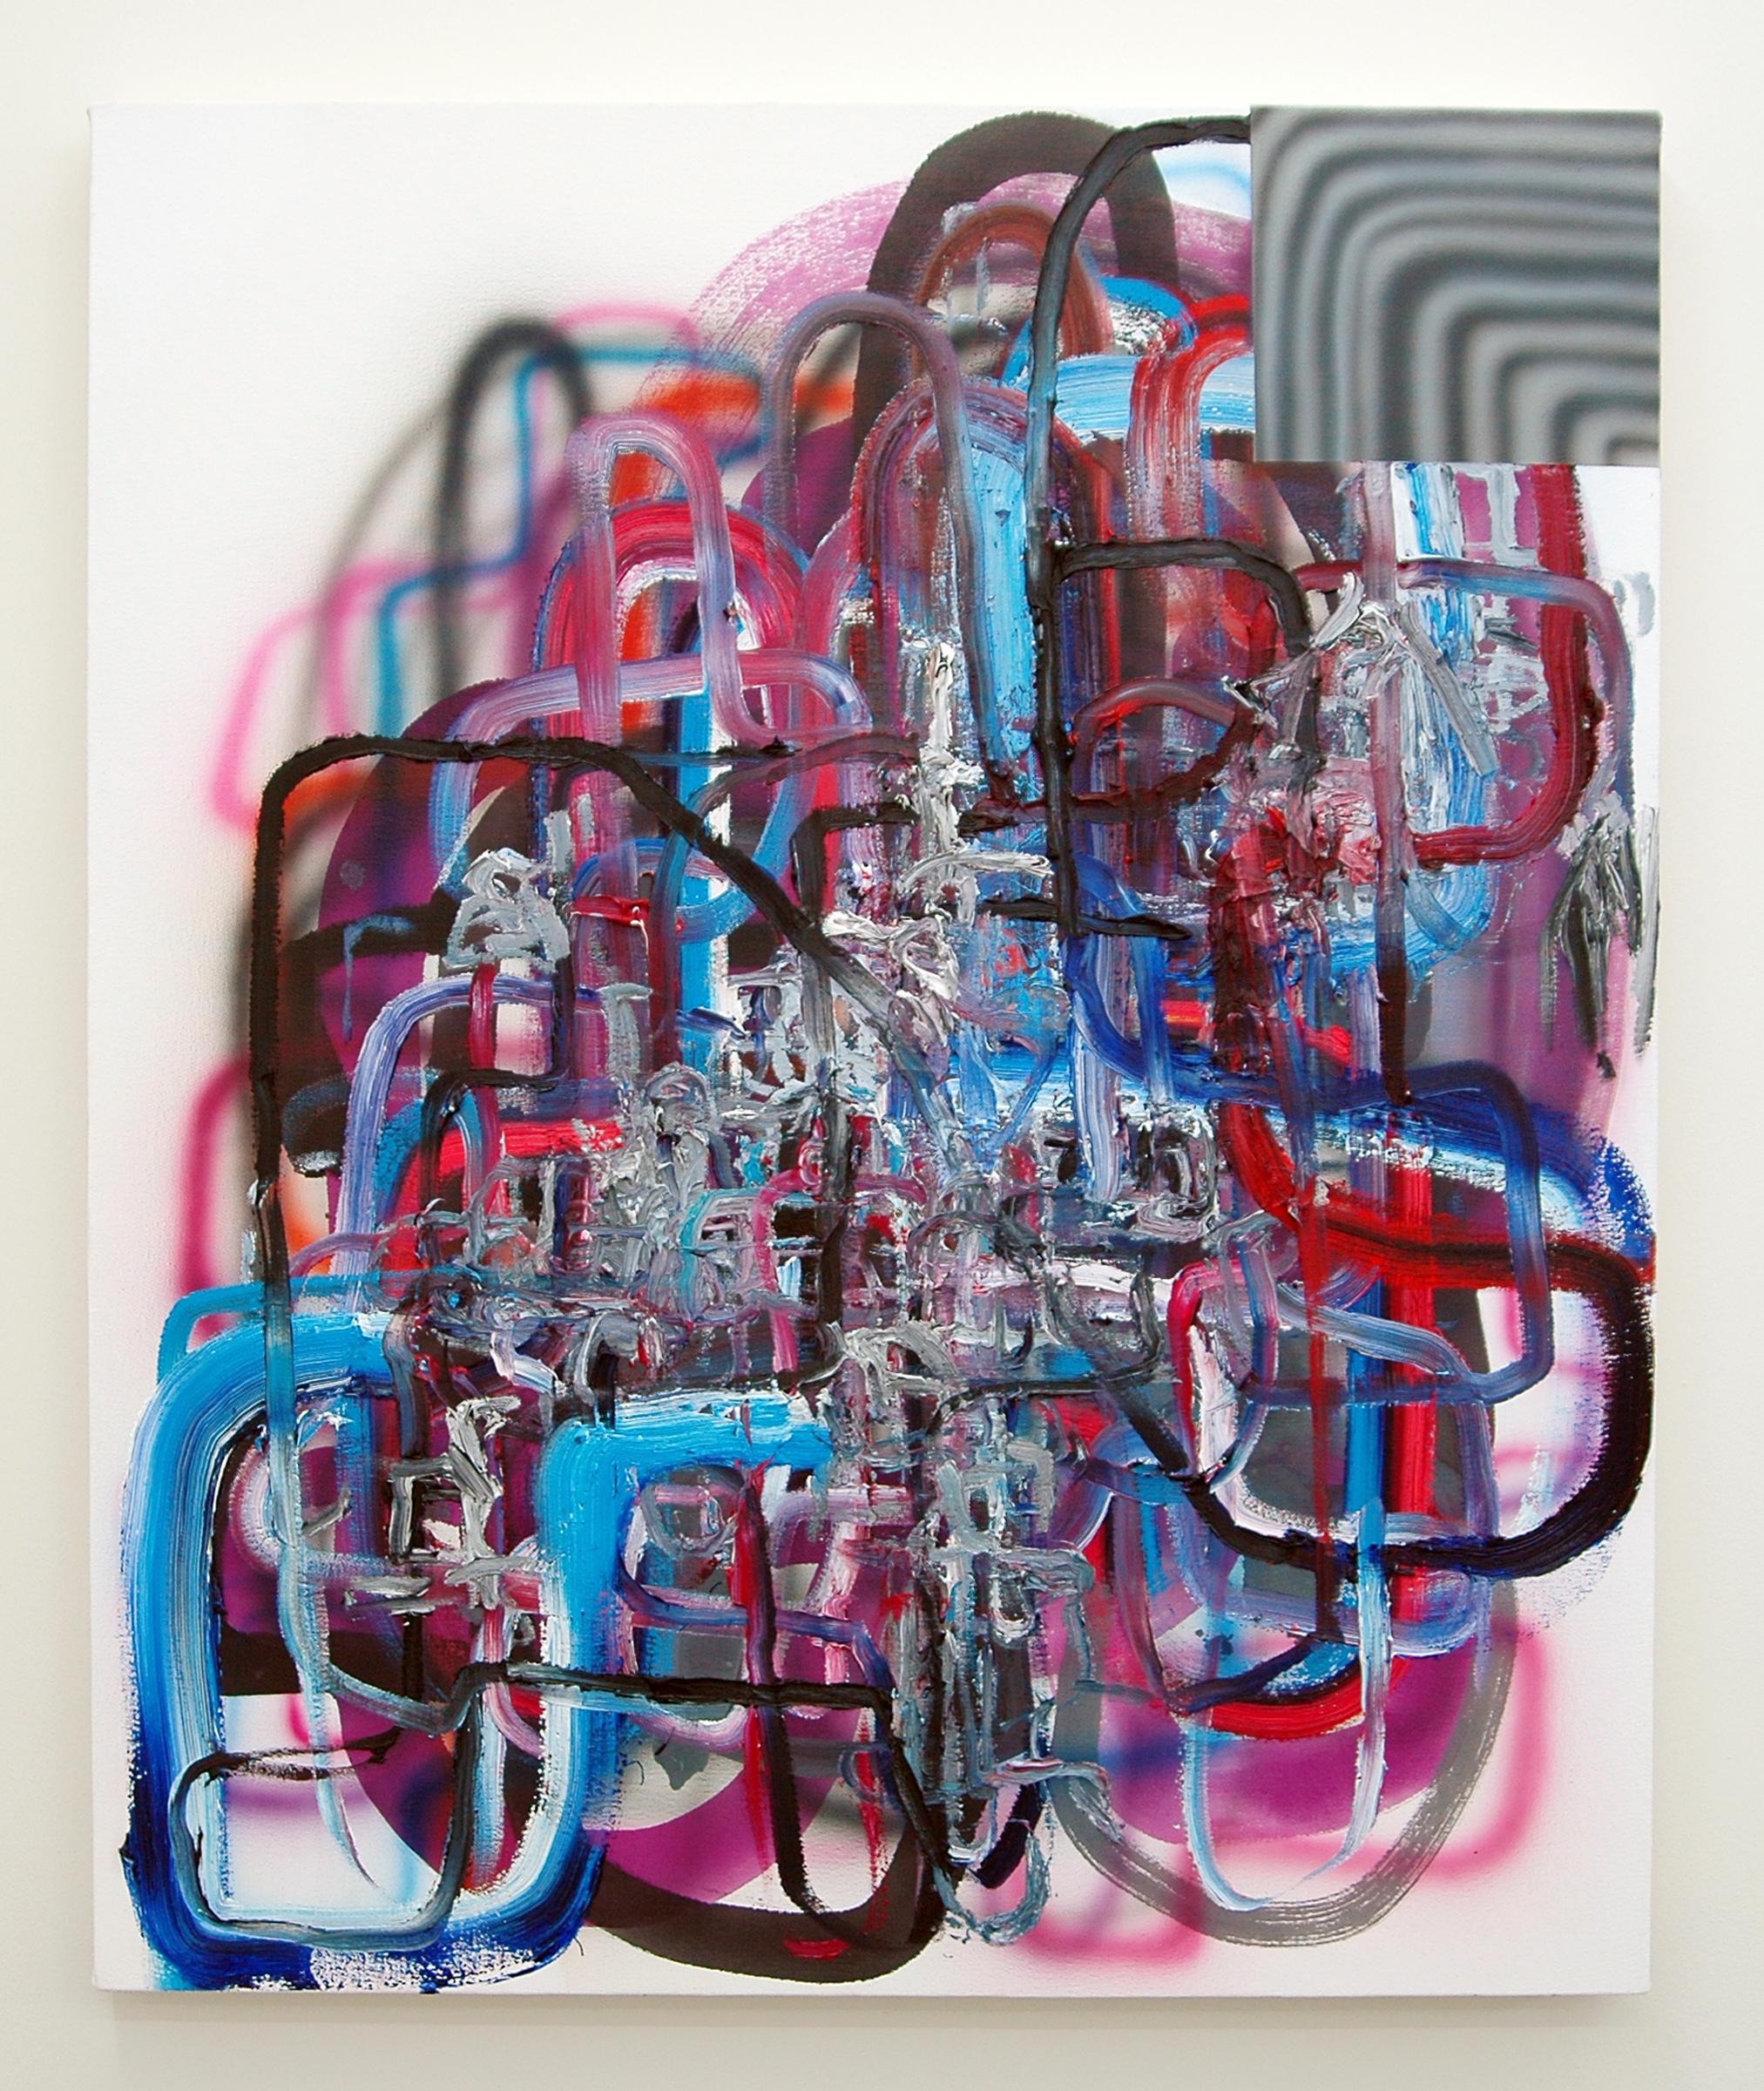 "/SLASH/  Josh Podoll, Broken Foot, oil and acrylic on canvas, 36"" x 30"", 2014"